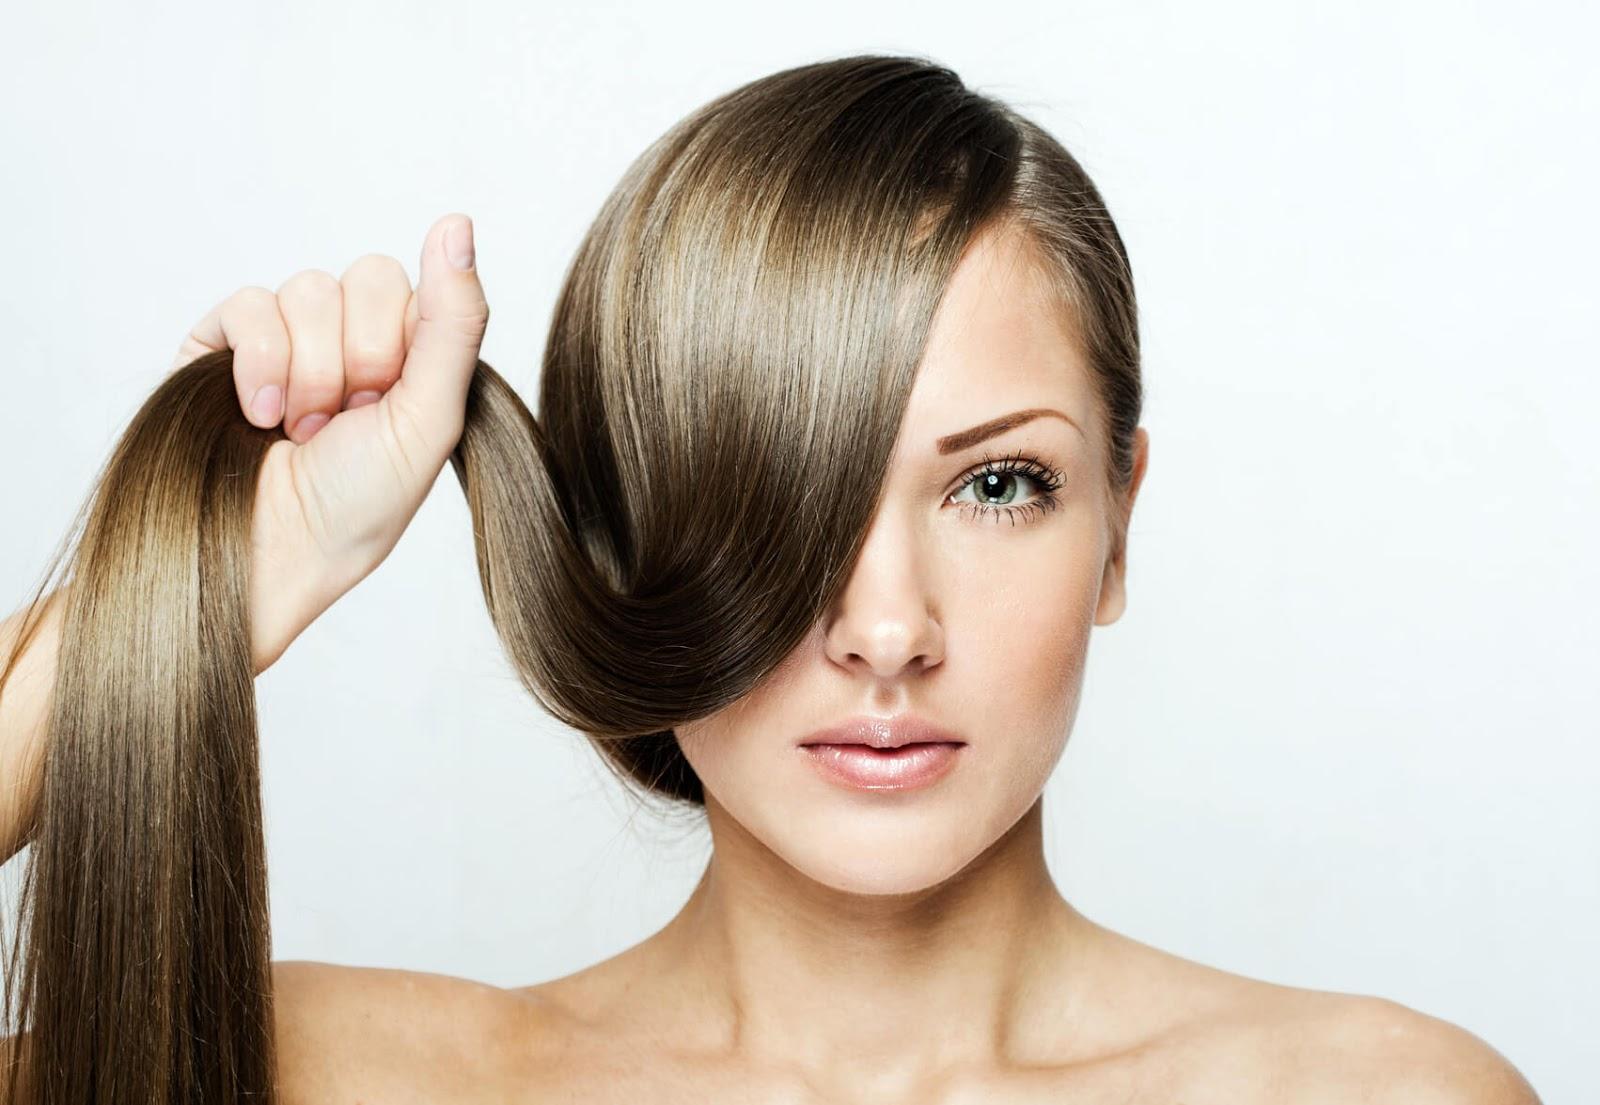 a835443e5 وصفات لتقوية الشعر وتطويله – وصفاتي